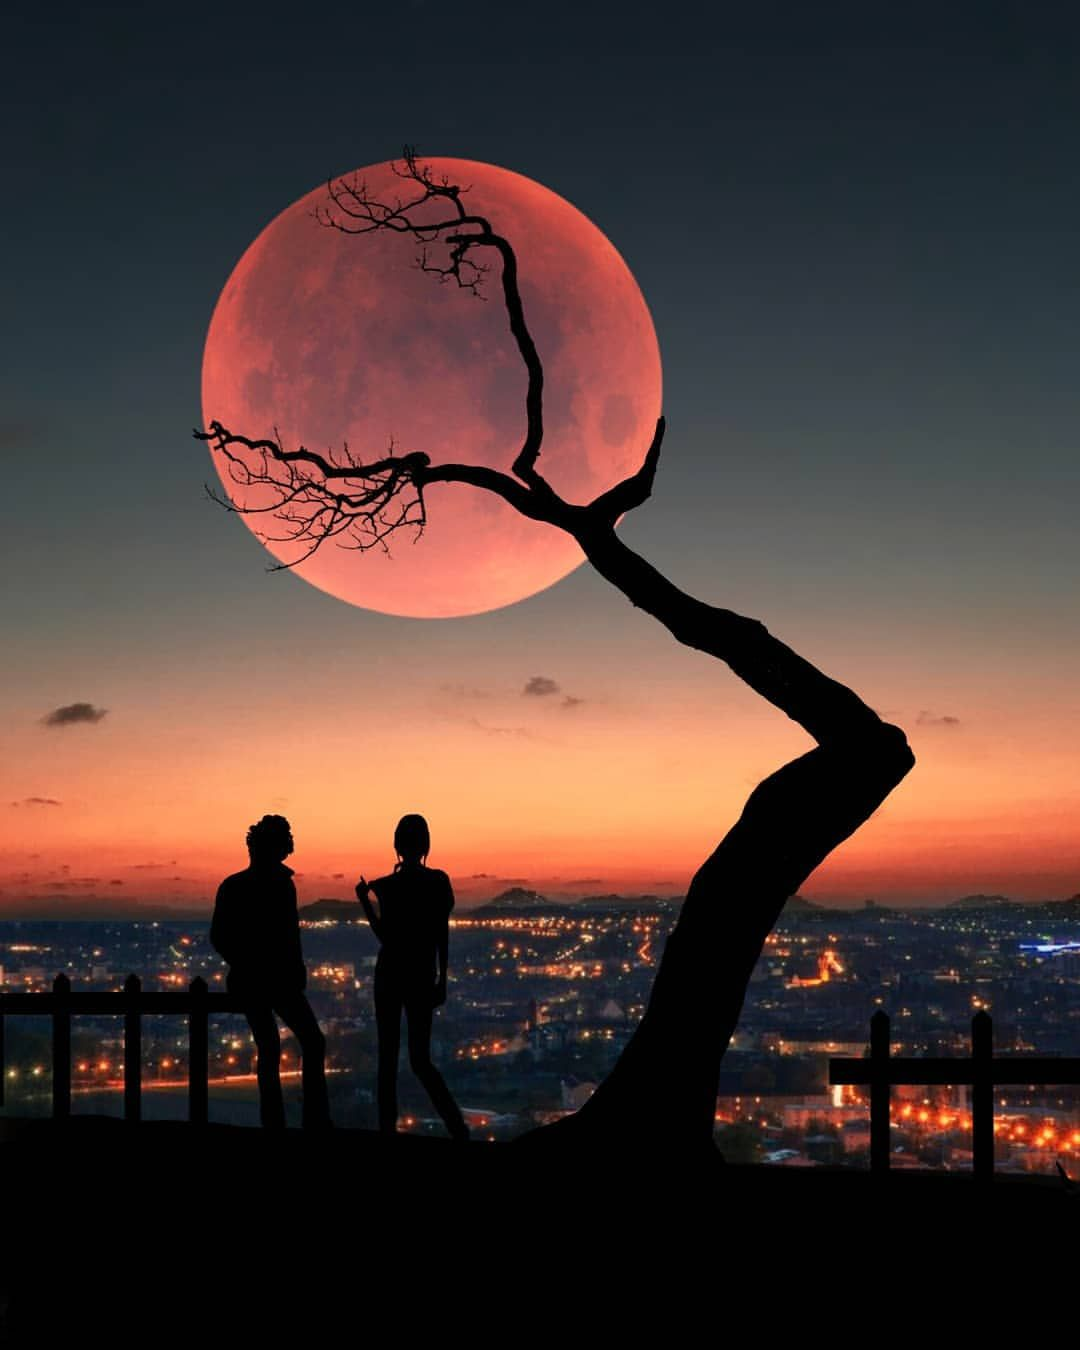 Surreal and Dreamlike Photo Collages by Abdullah Evindar #photography #milliondollarvisuals #theuniversalart #artofvisuals#visualambassadors #creartmood